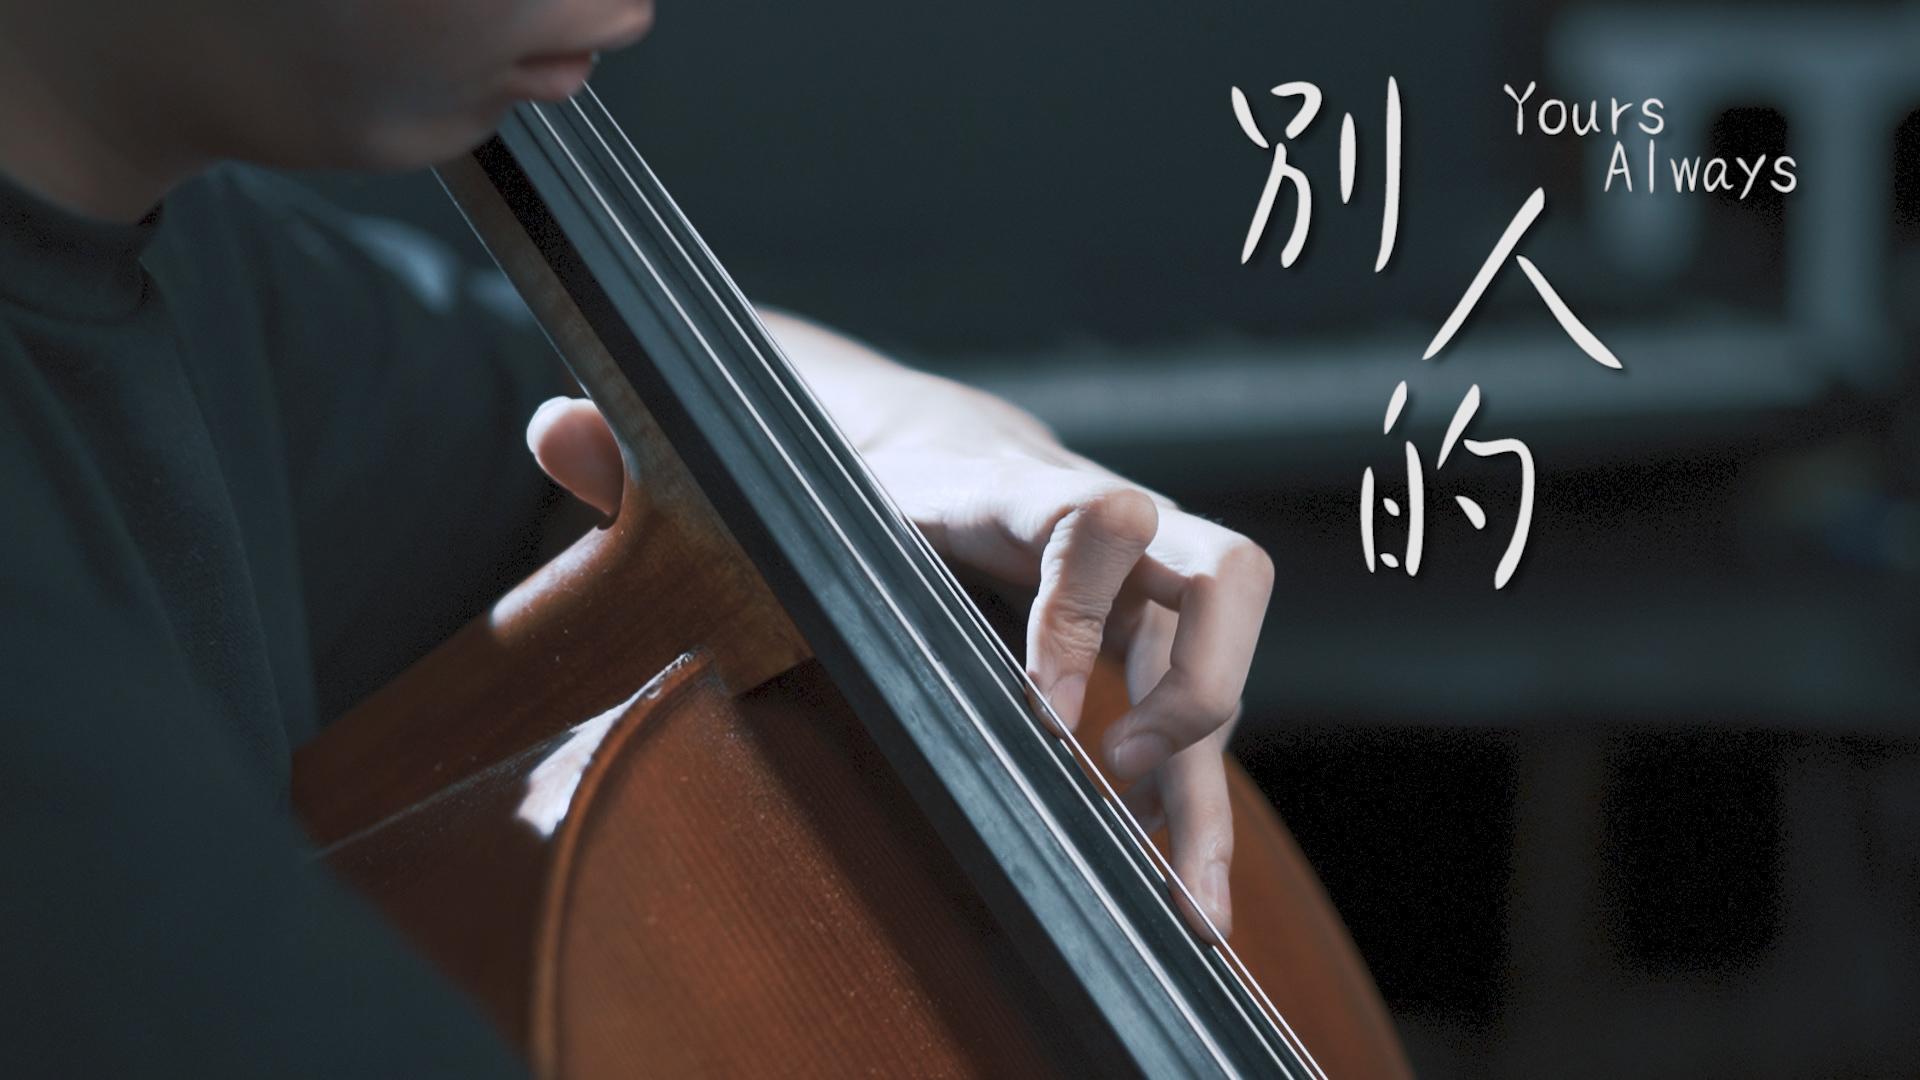 Yours Always - 《別人的》電影《孤味》片尾曲, 詞:徐若瑄   曲:陳冠甫, Cello Cover 大提琴演奏 《孤味》電影片尾曲 『cover by YoYo Cello』